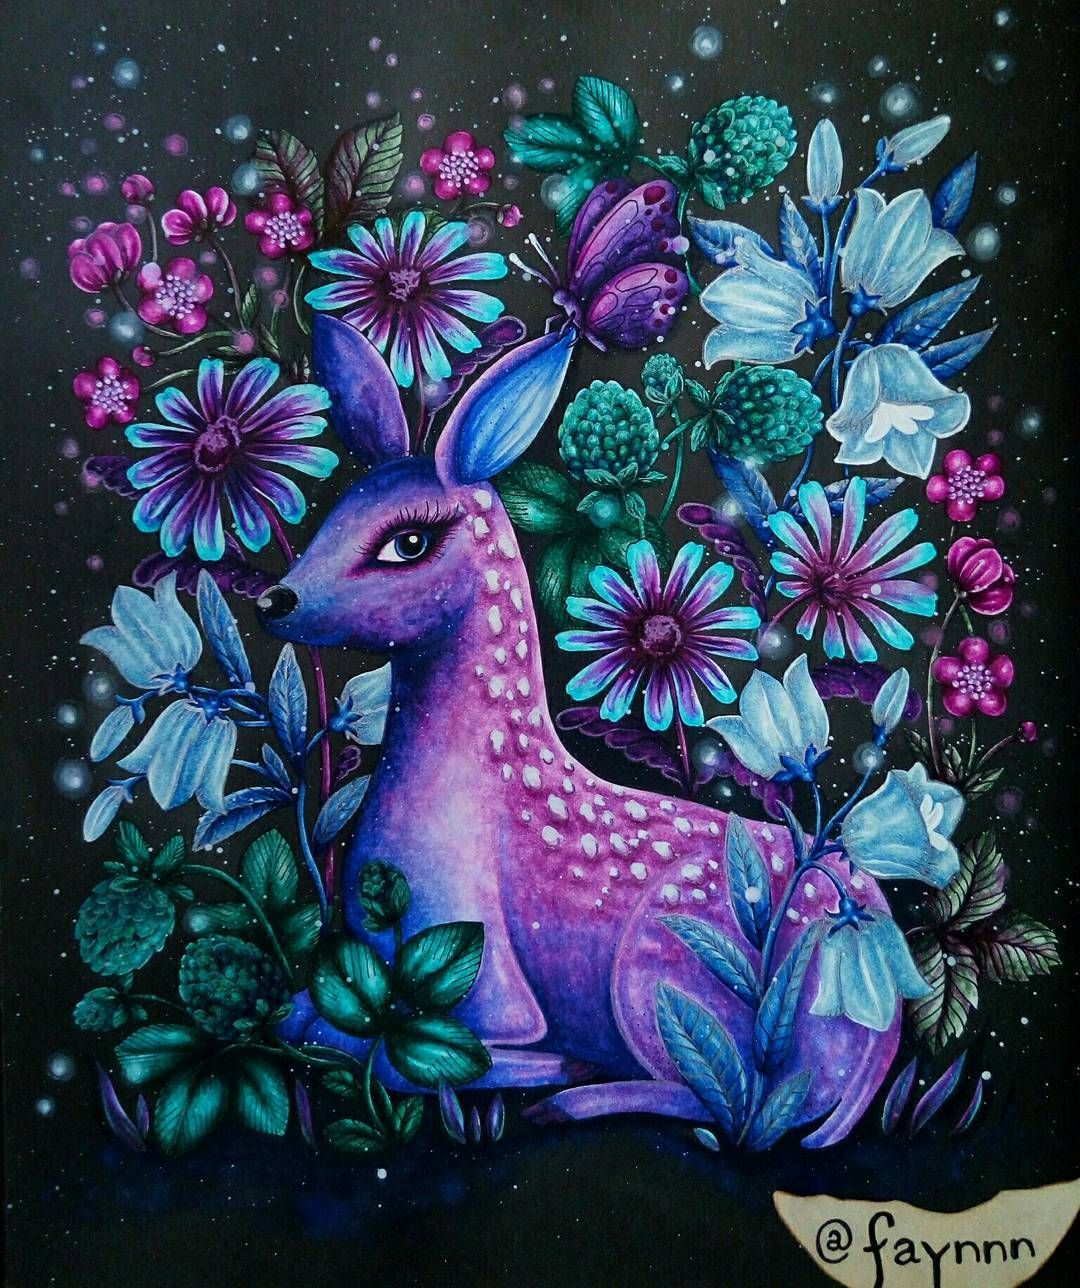 Mariatrolle Blomstermandala Twilightgarden Coloriage Coloring Colouring Pen Gelpen Book ArtColored PencilsFineliner